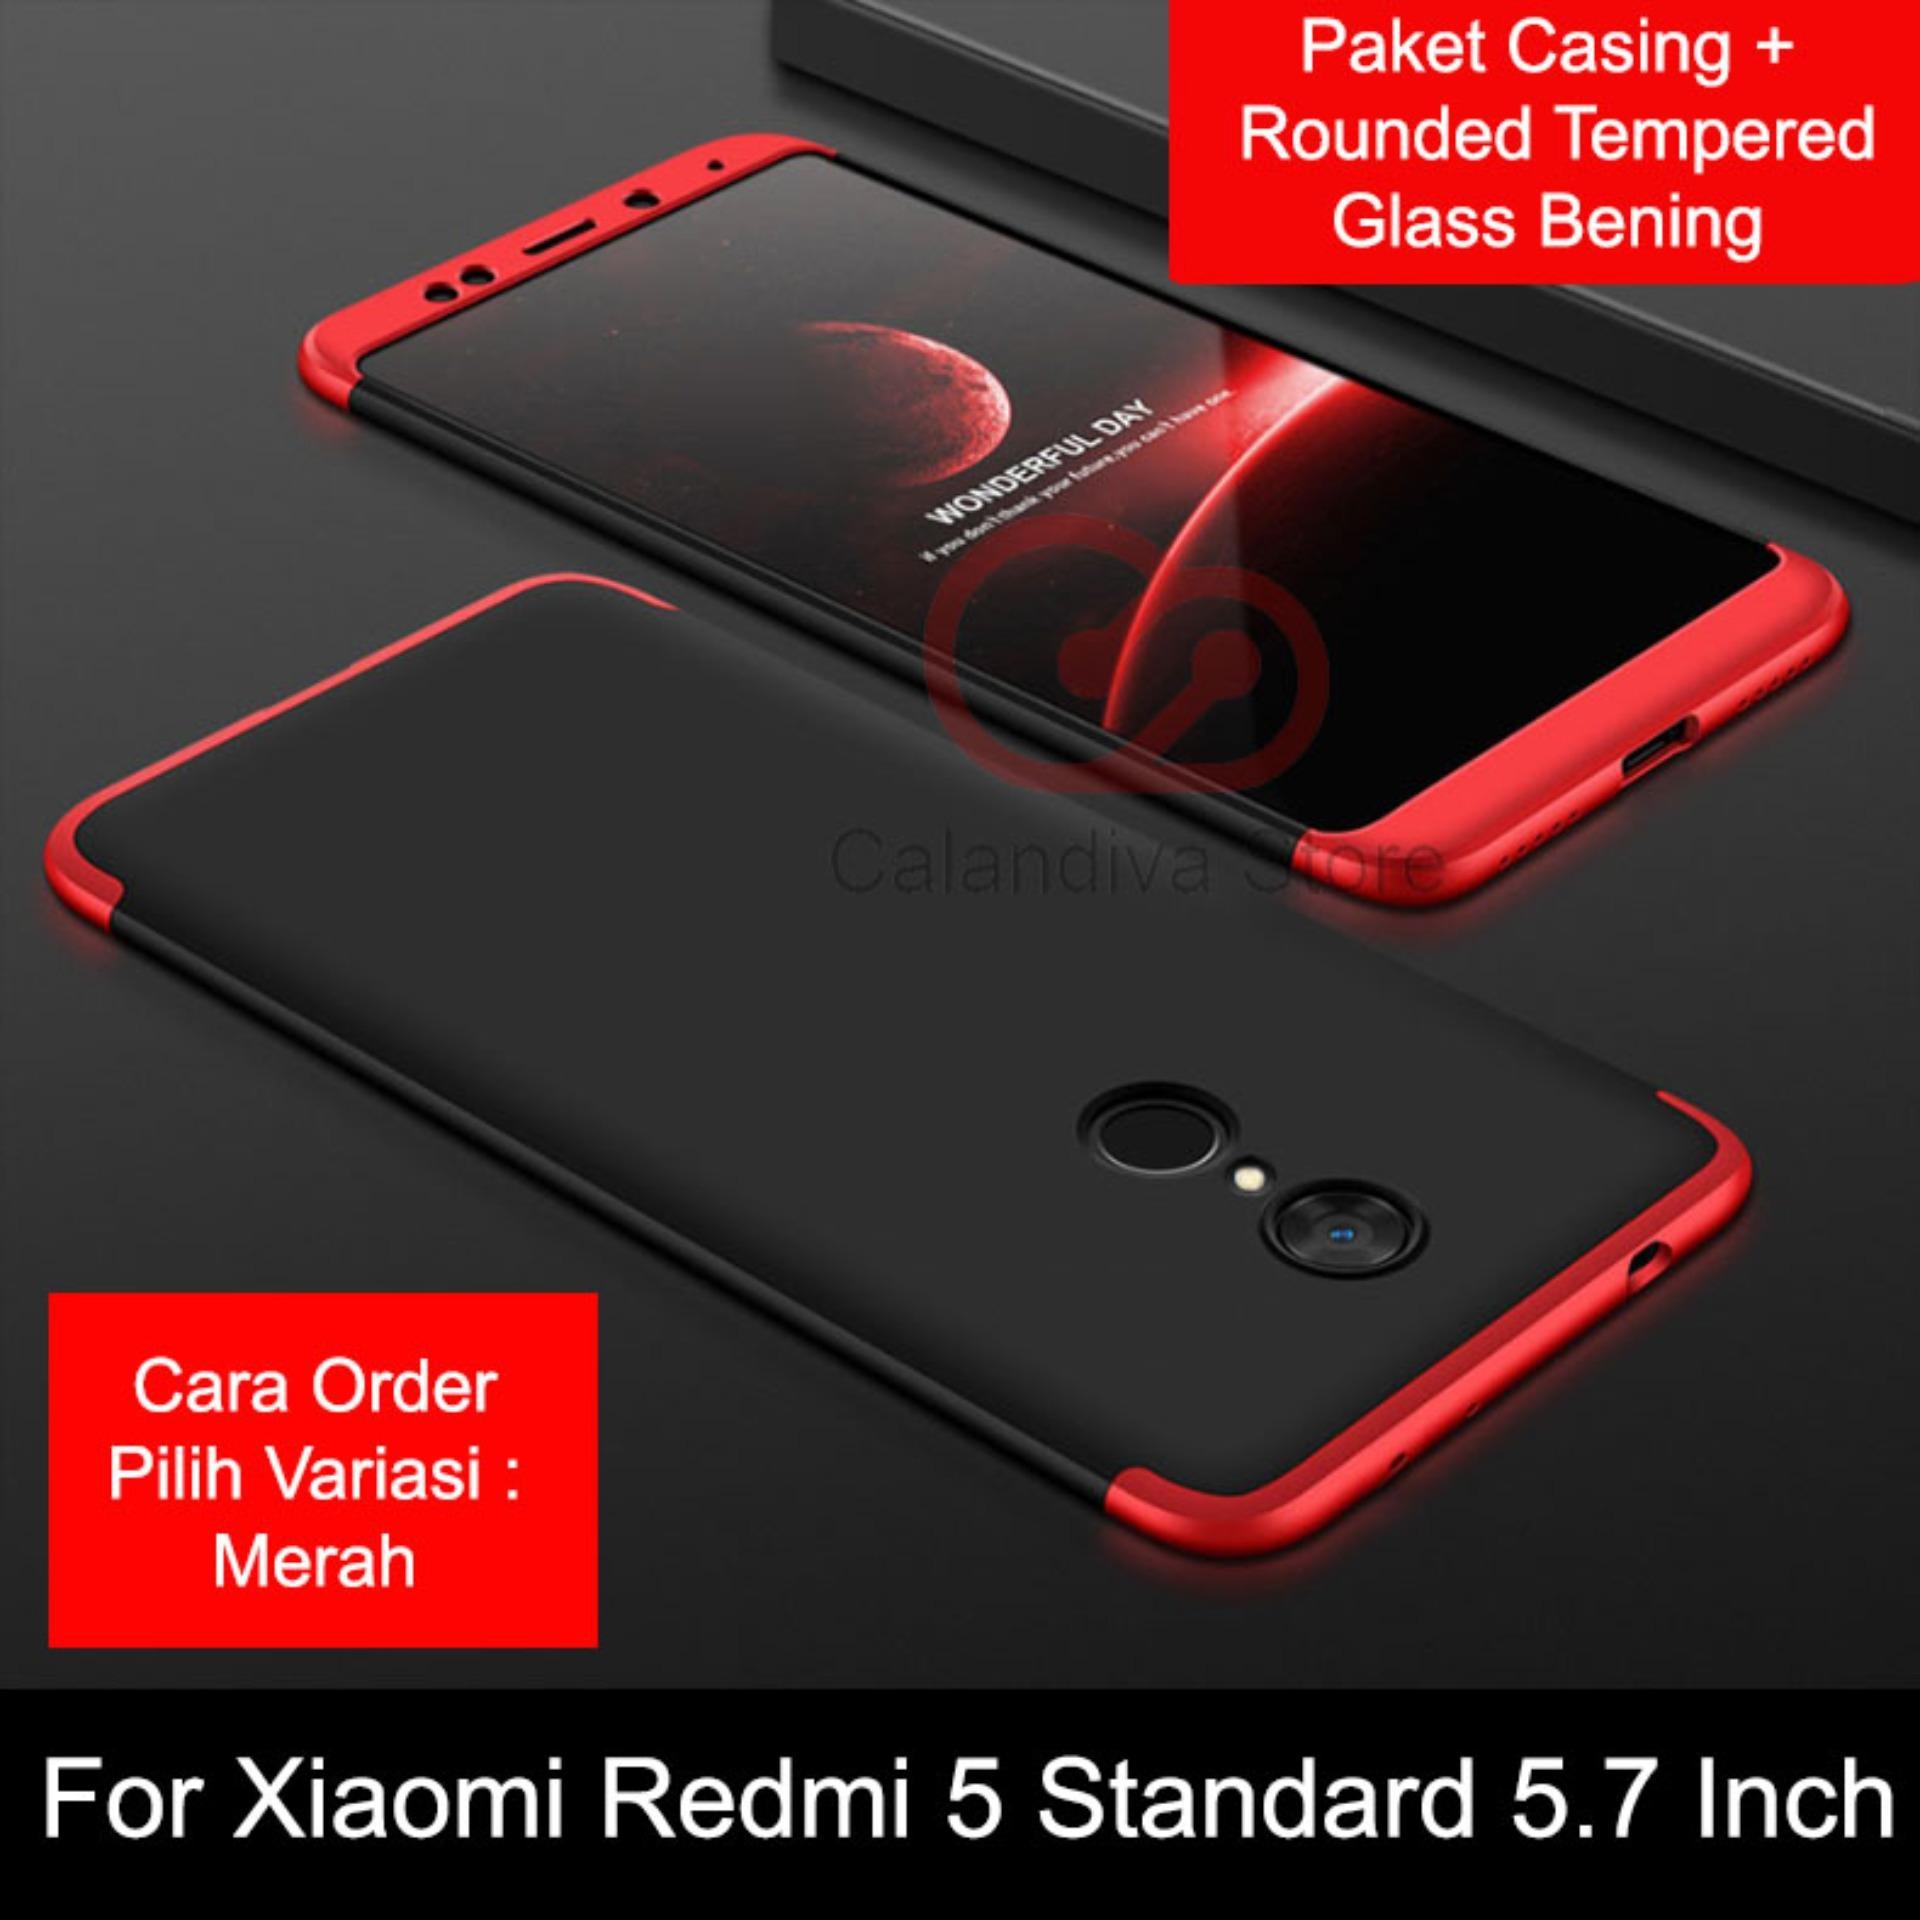 Toko Calandiva Premium Front Back 360 Degree Full Protection Case Quality Grade A For Xiaomi Redmi 5 5 7 Inch Tempered Glass 2 5D Bening Termurah Jawa Barat